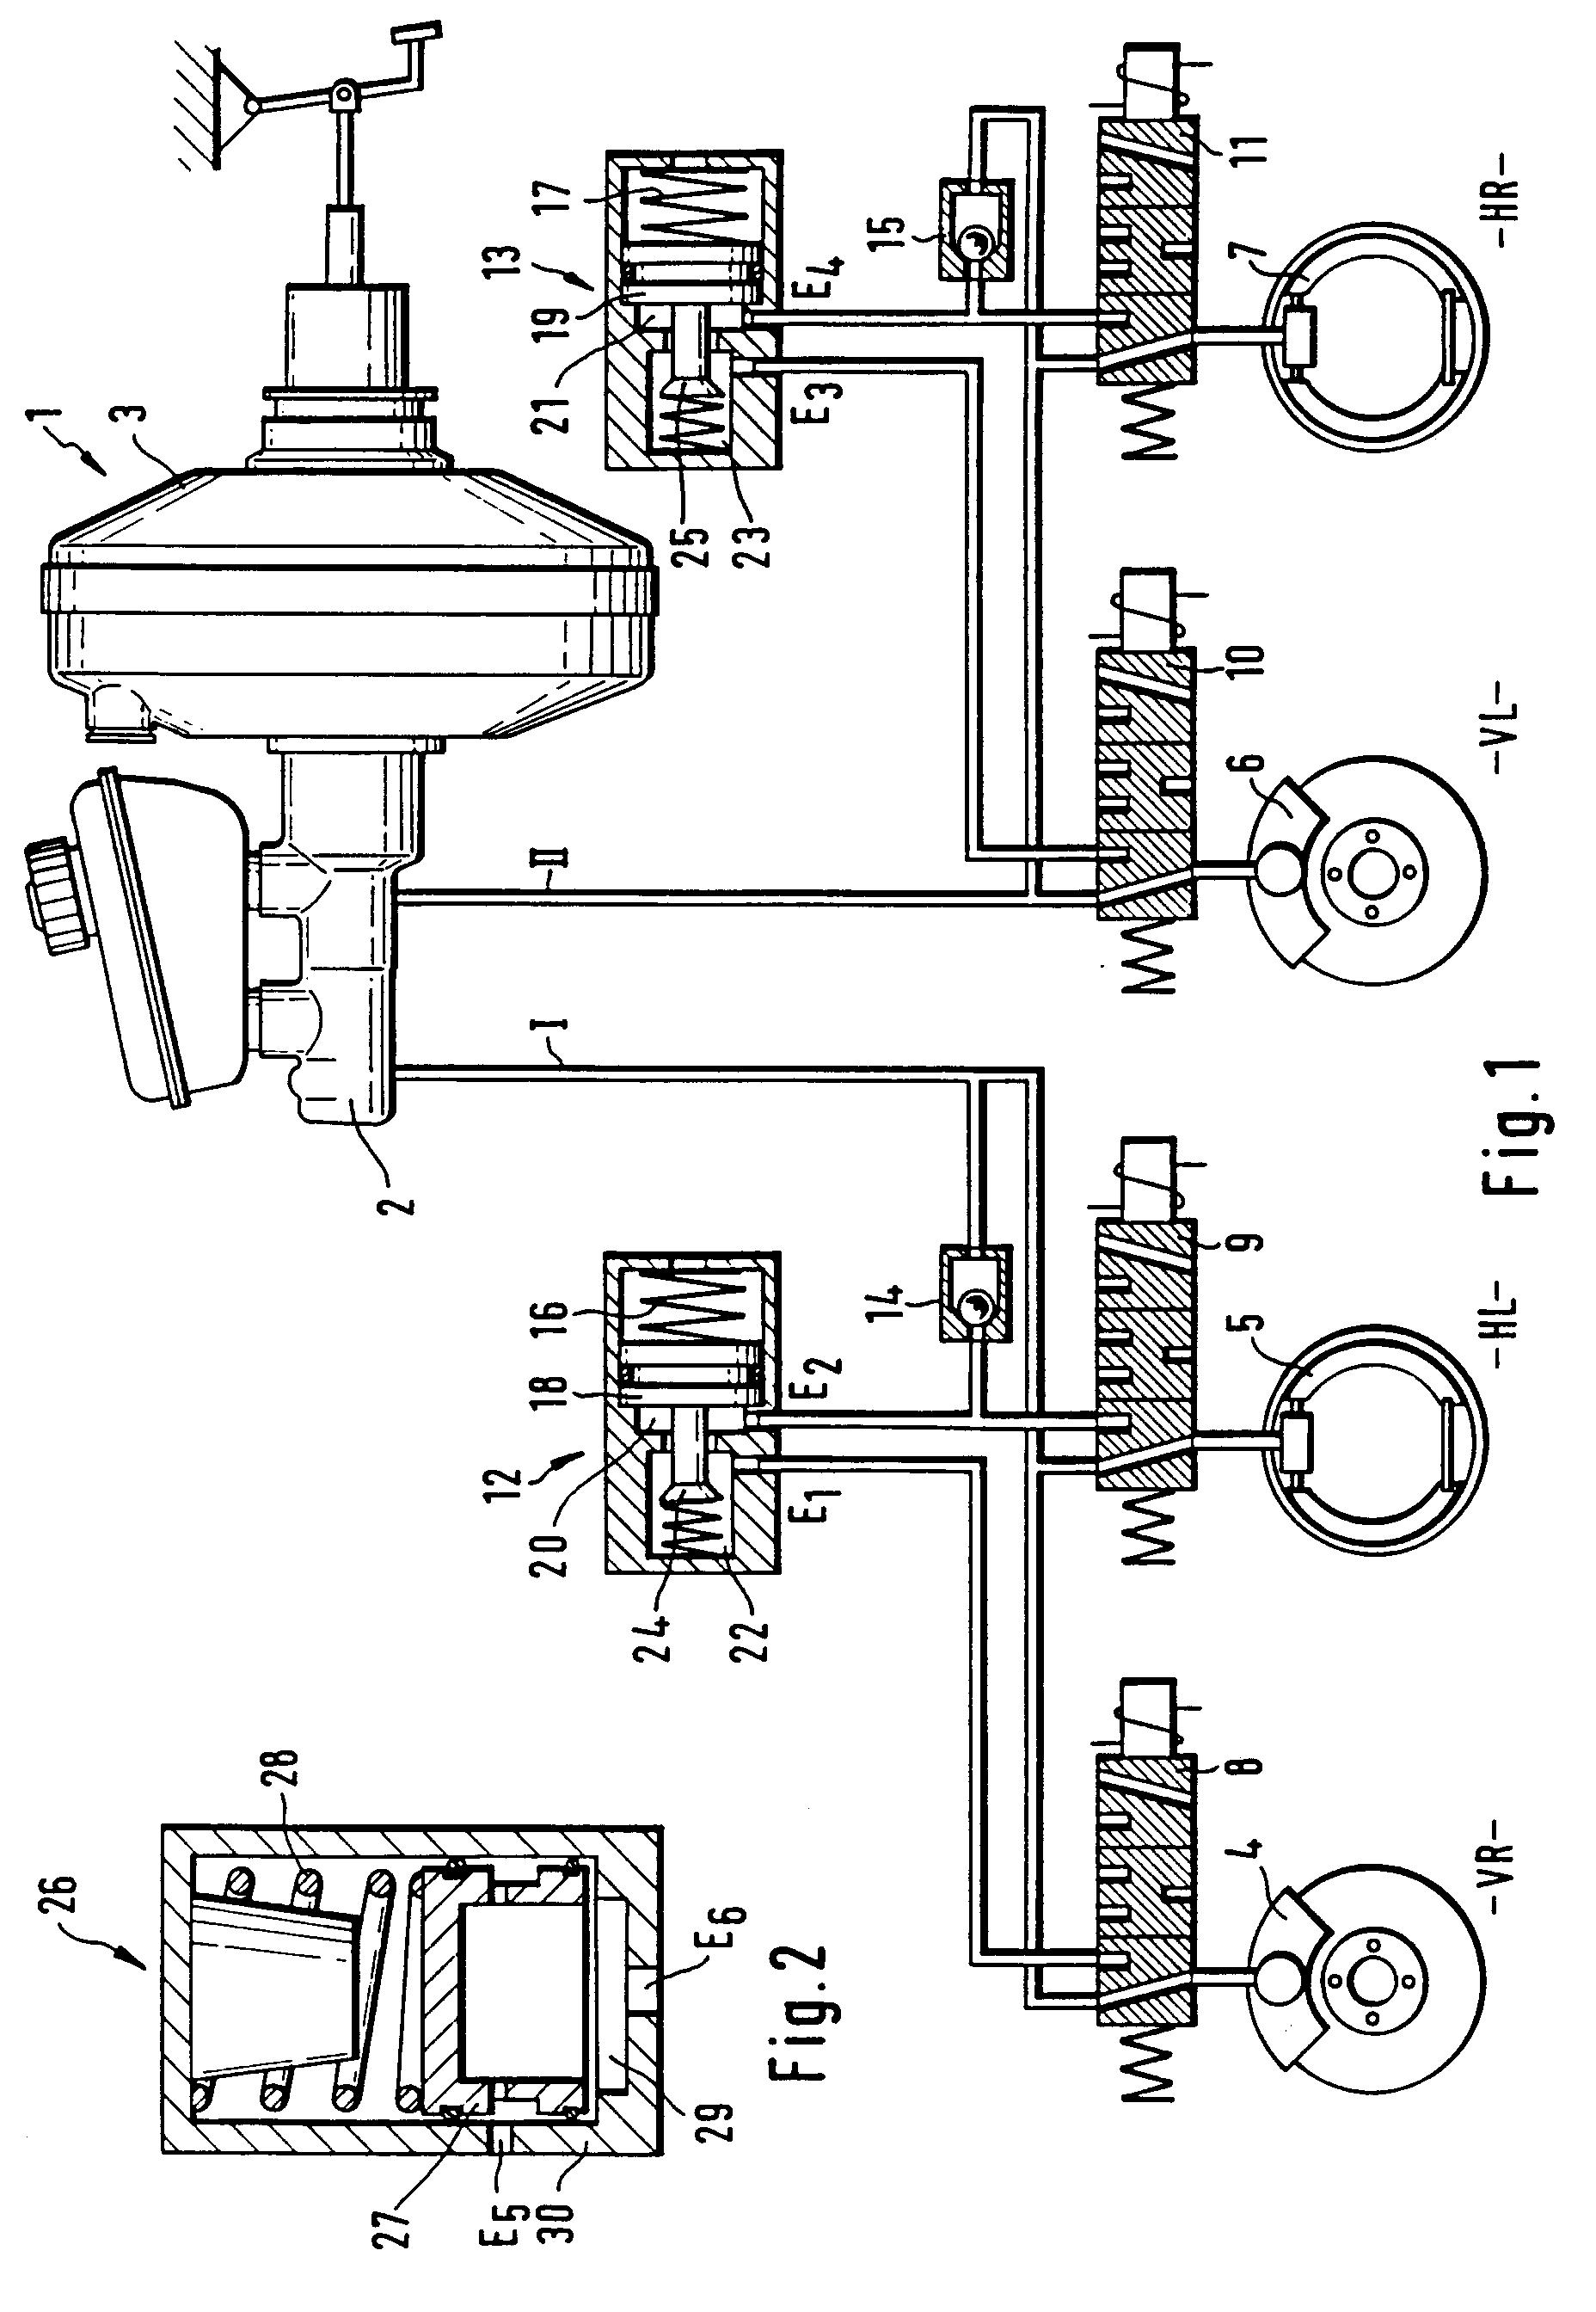 patent ep0726856b1 systeme de freinage a regulation antiblocage electronique google patents. Black Bedroom Furniture Sets. Home Design Ideas